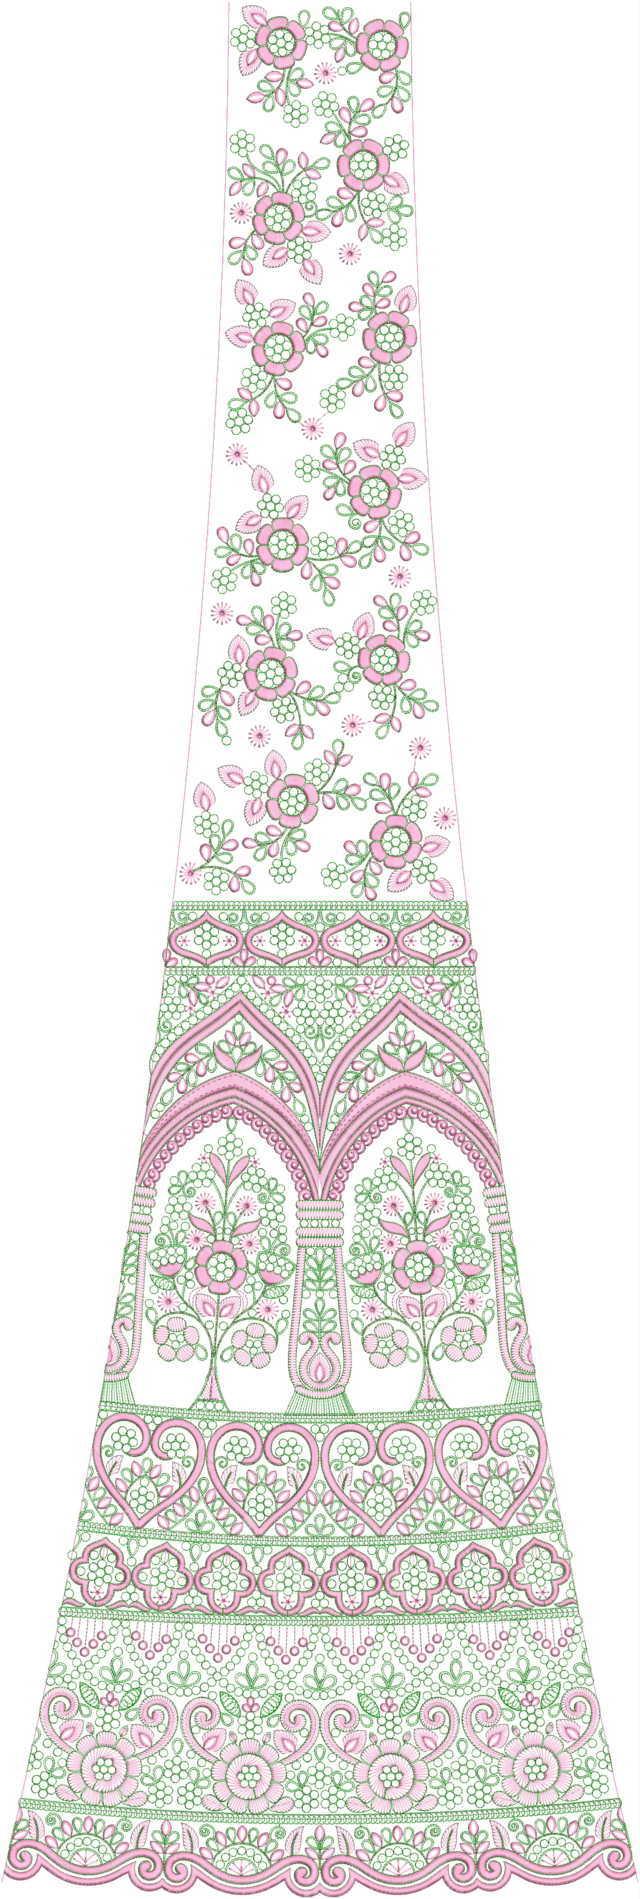 Lehengha / kali Embroidery Design